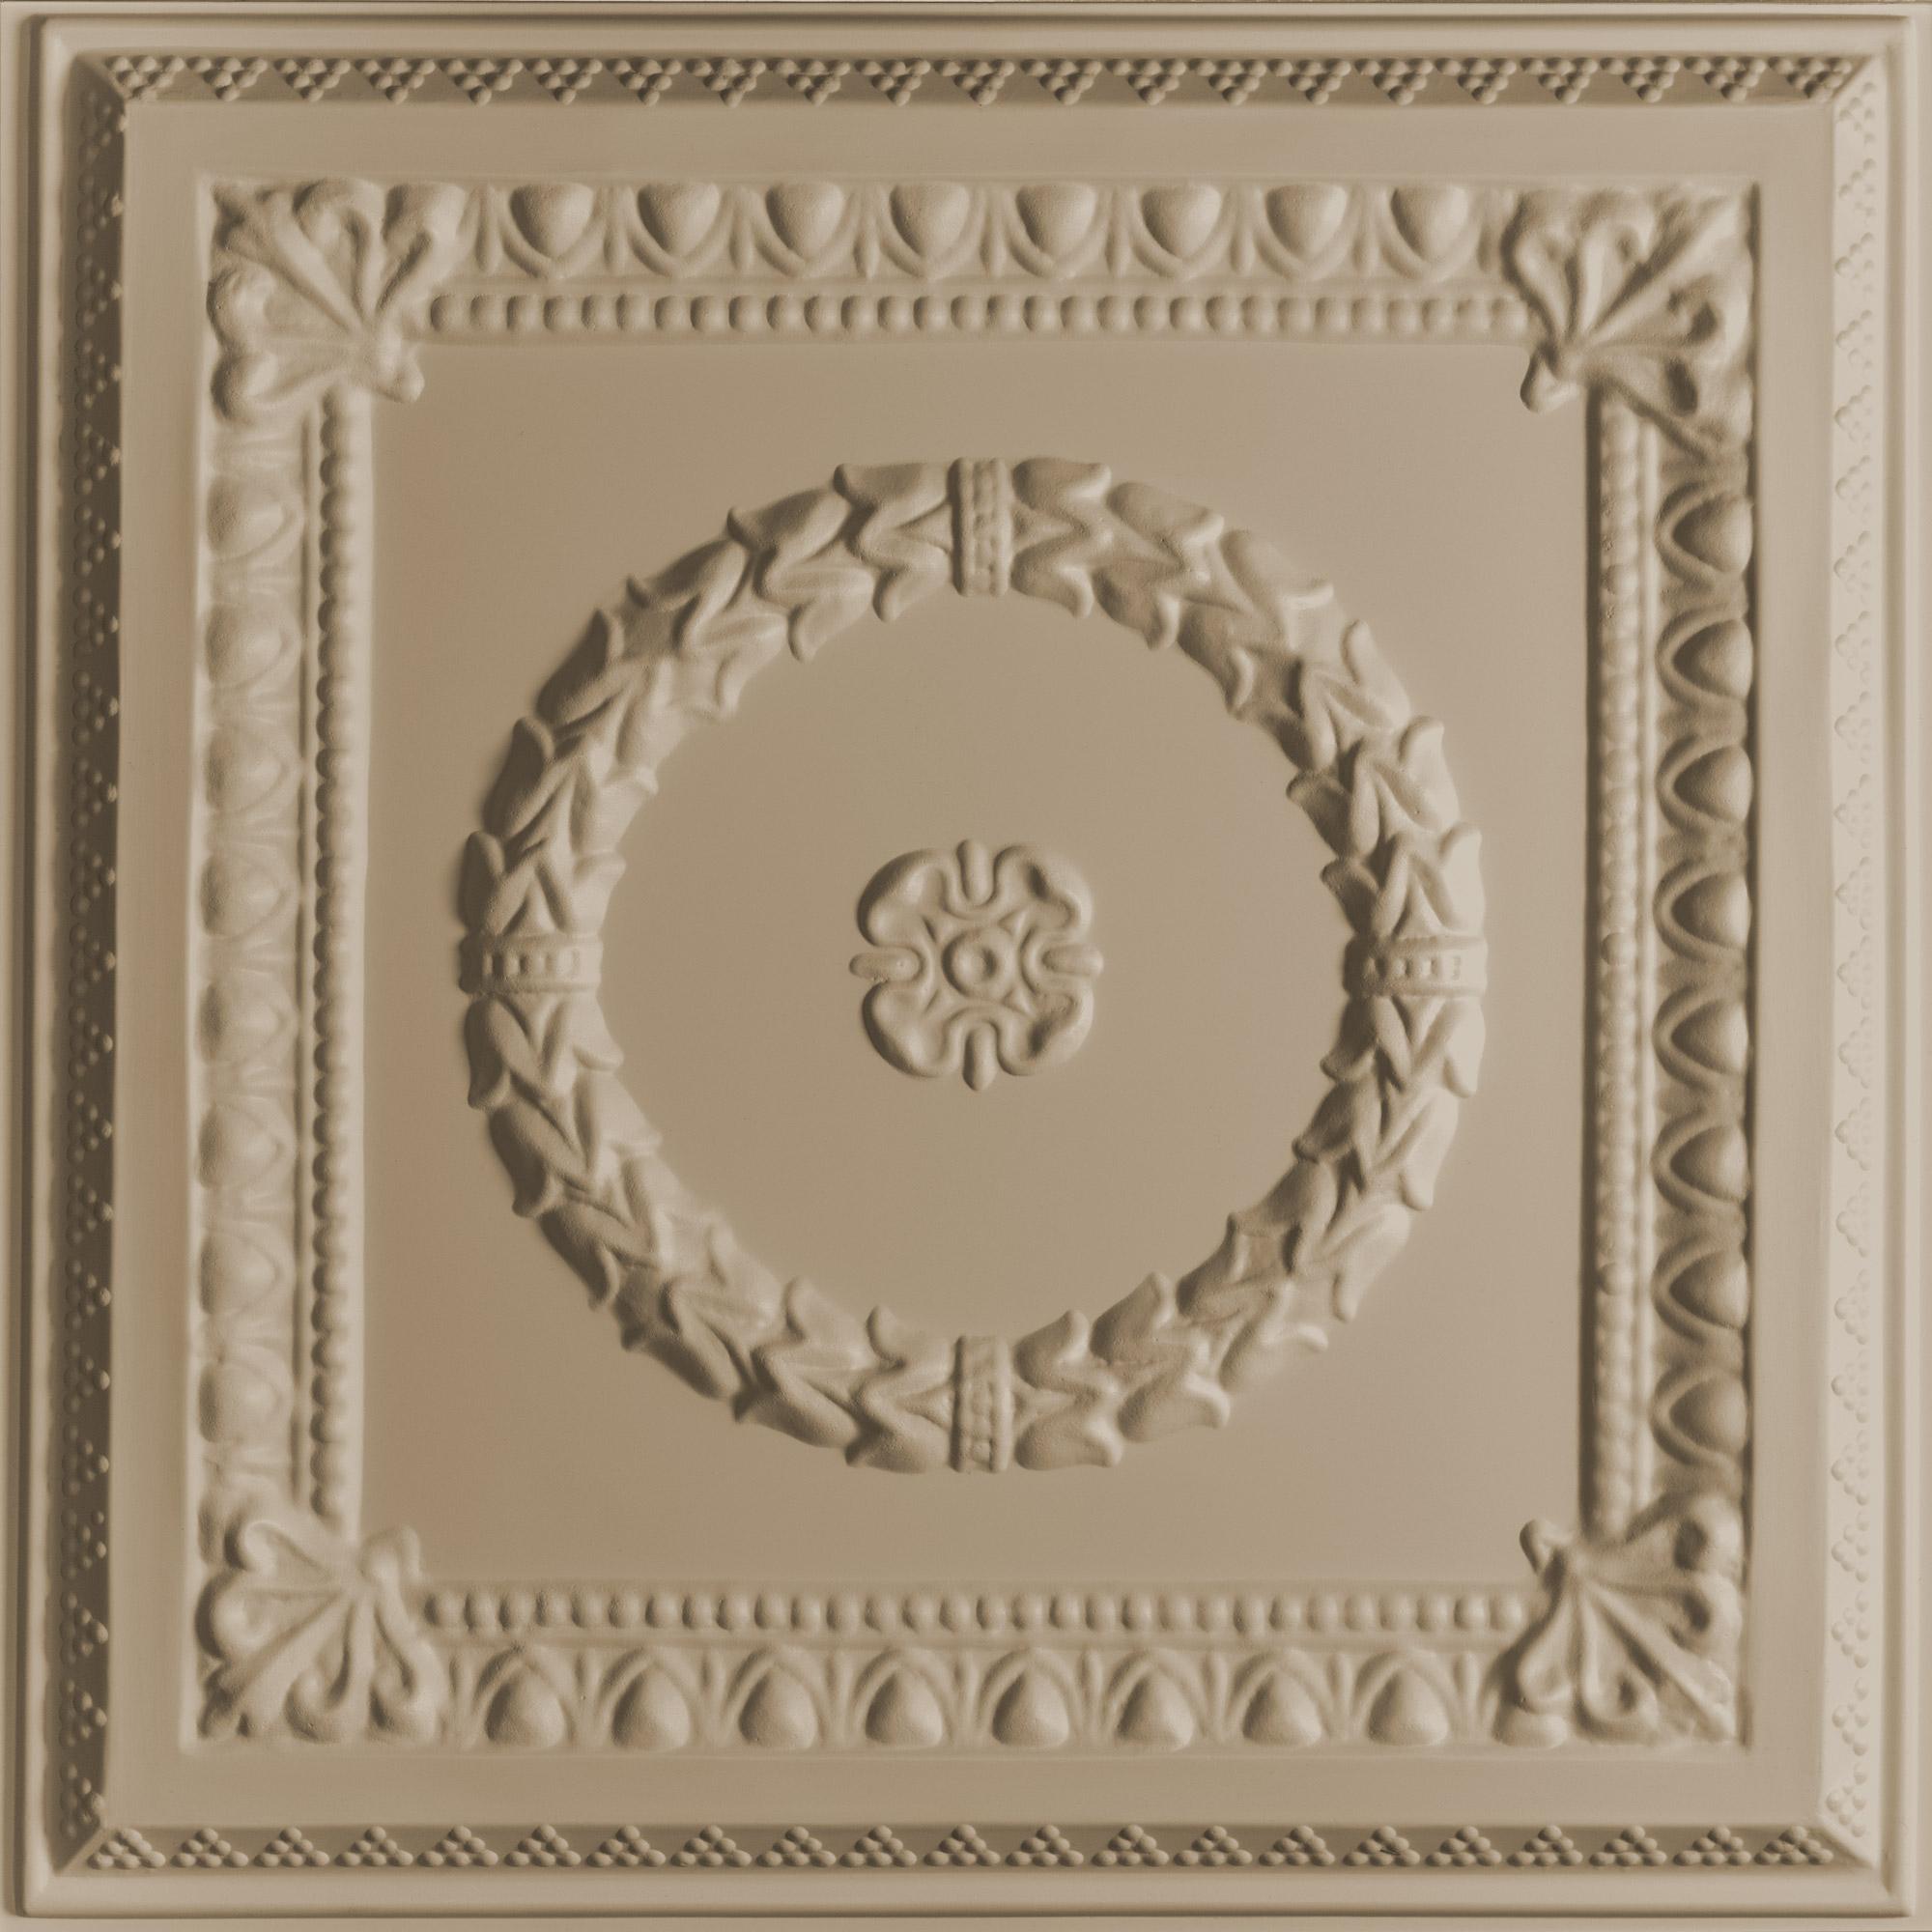 Evangeline Ceiling Tiles